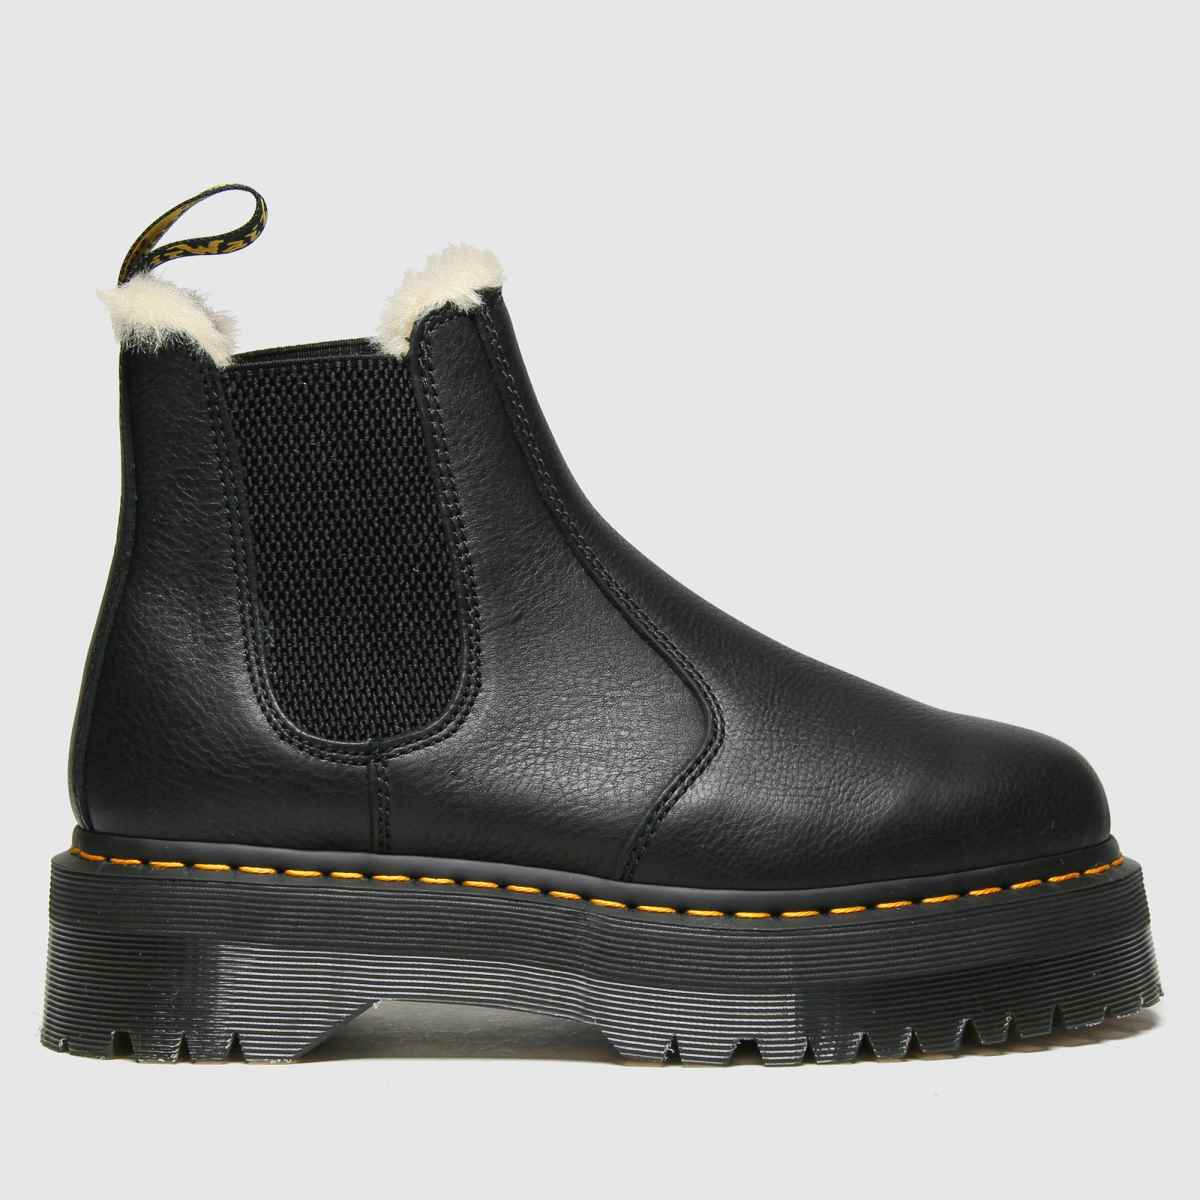 Dr Martens Black 2976 Quad Fur Lined Boots